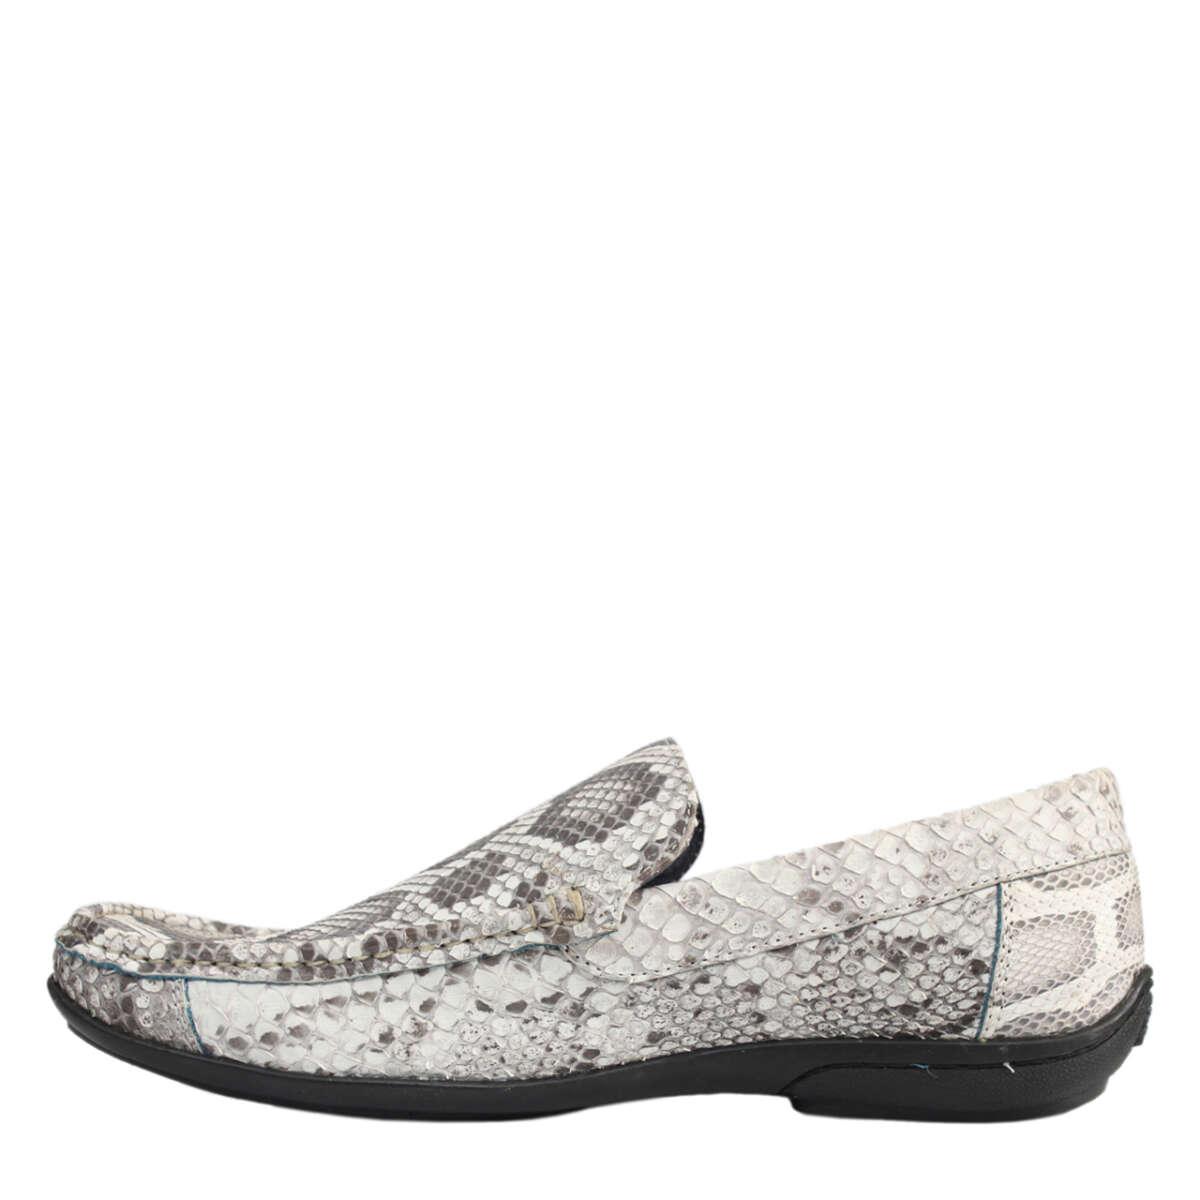 Giày lười nam da trăn T857a